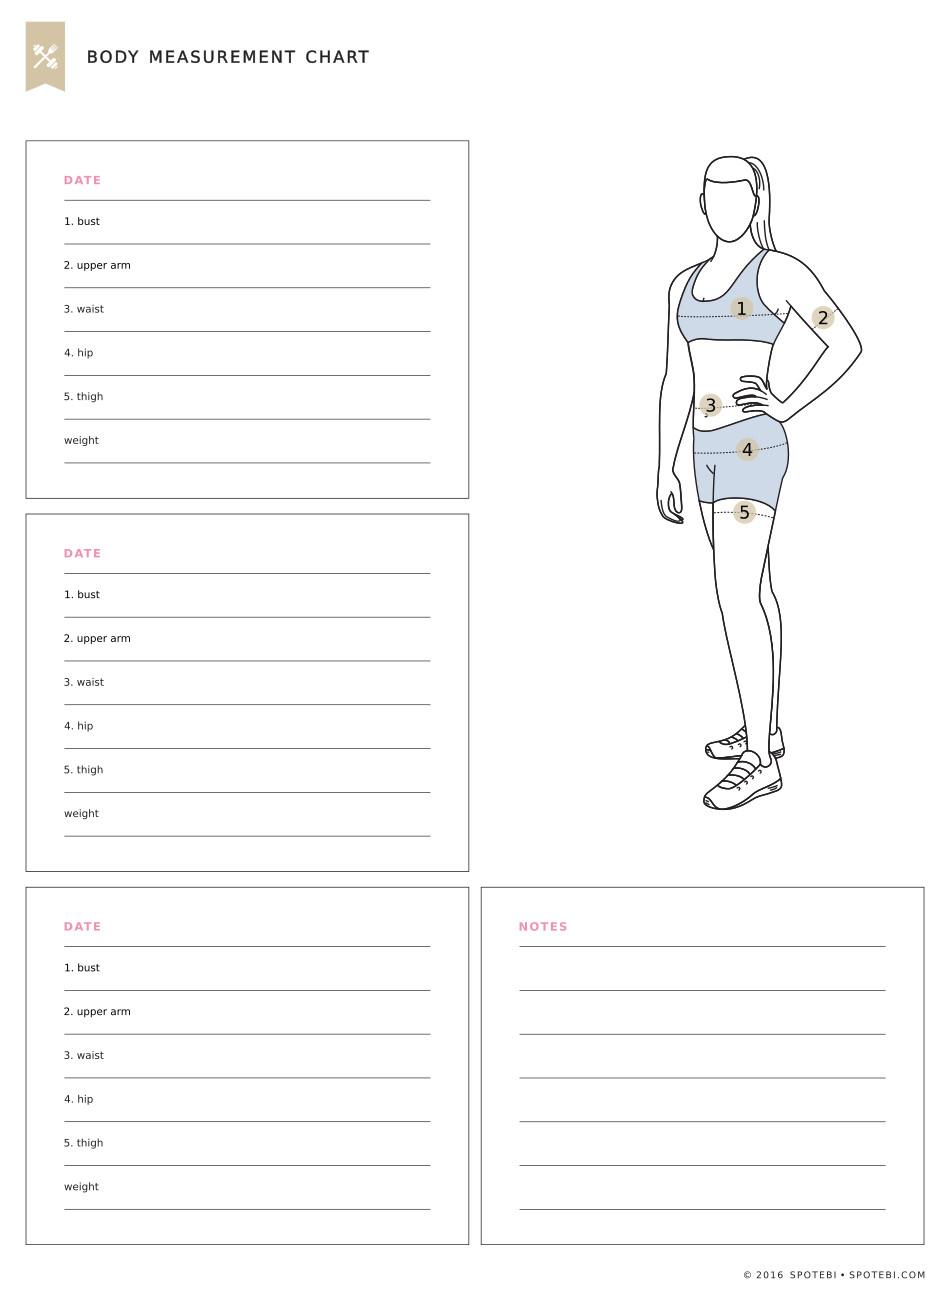 Body Measurement Chart Printable | Room Surf